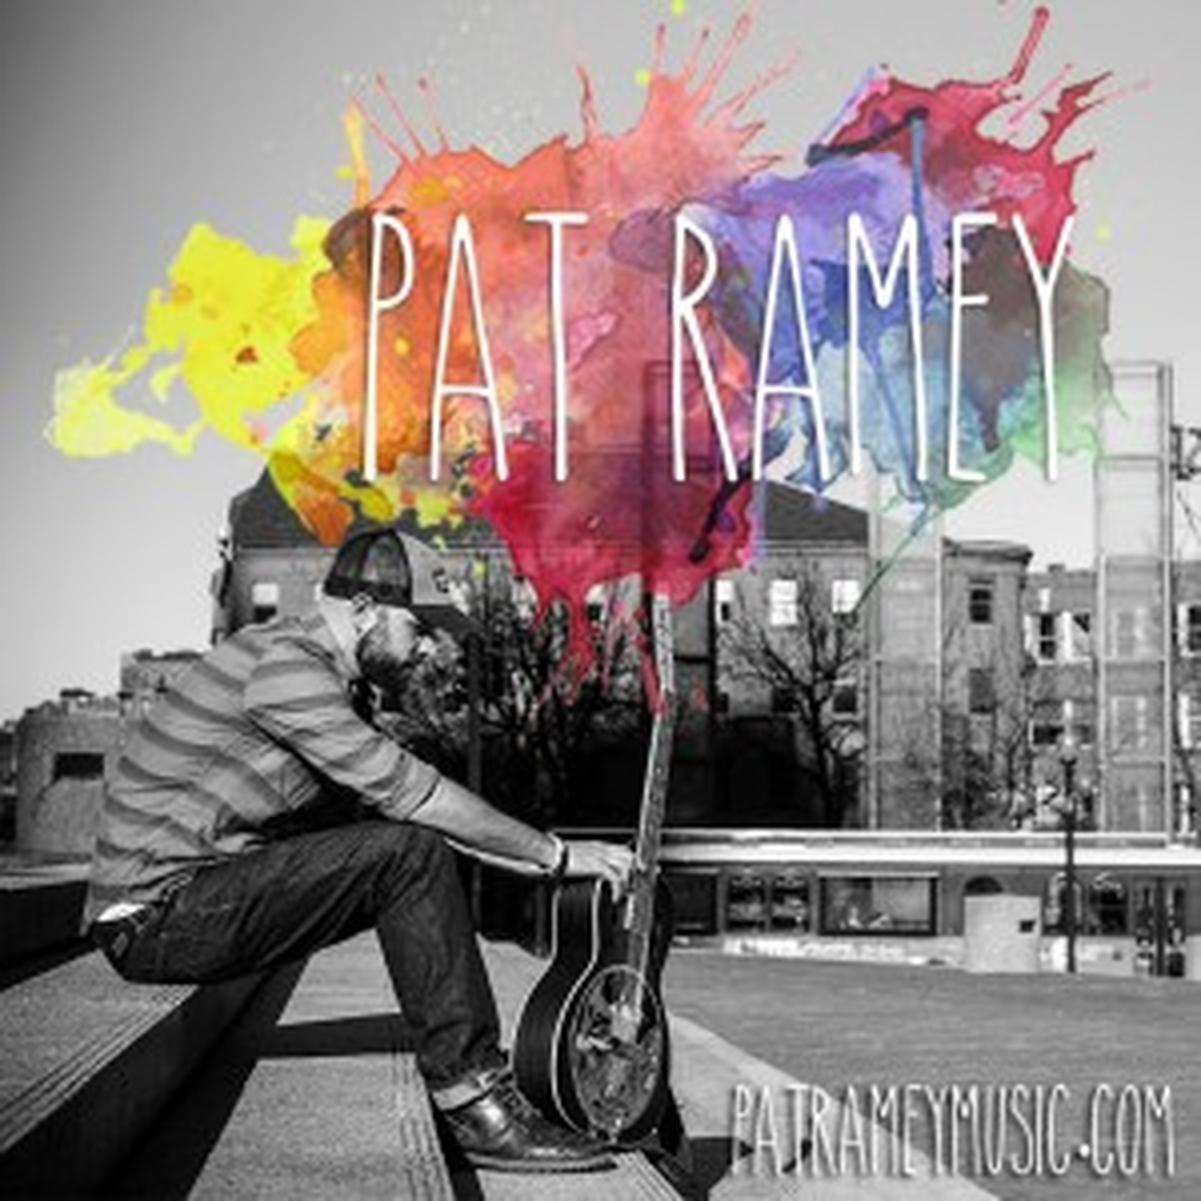 PatRamey